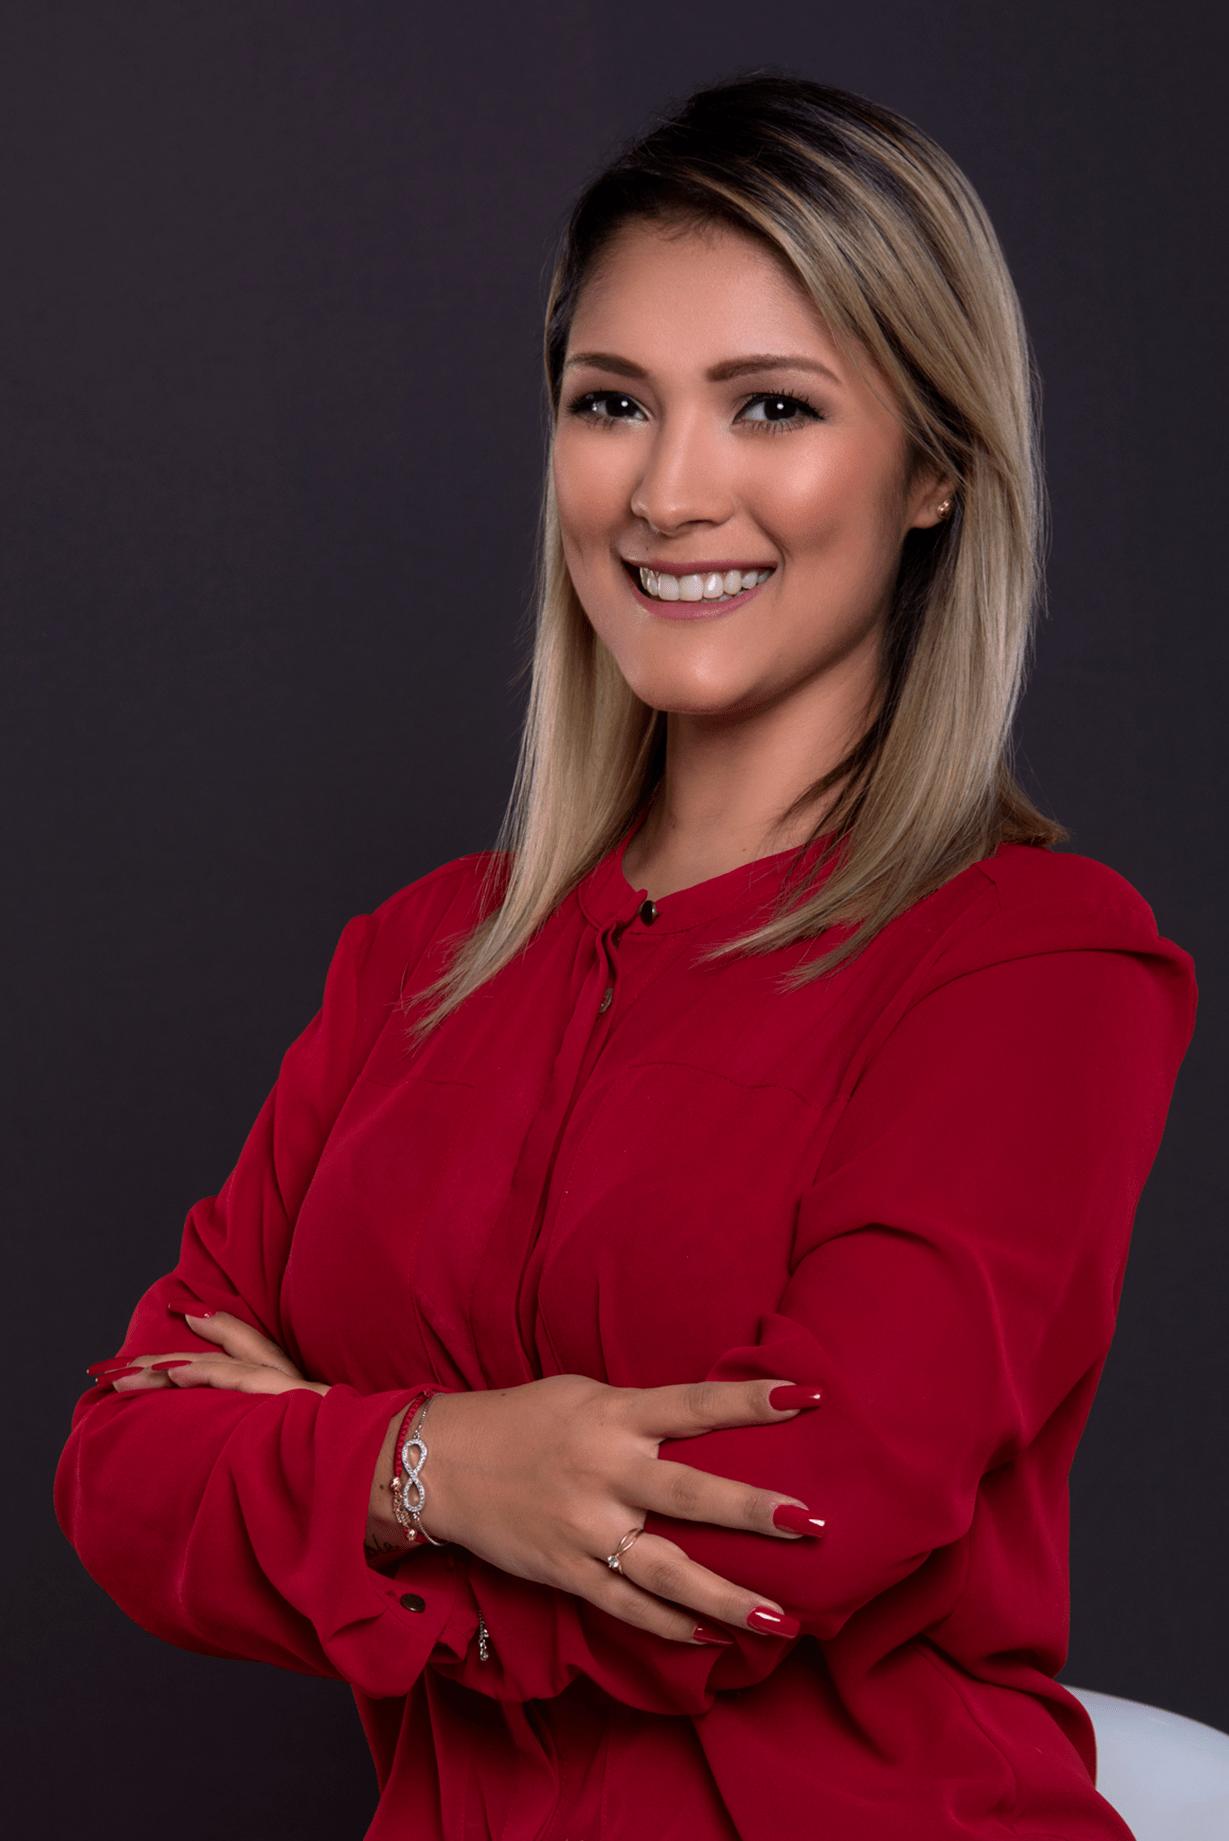 Ana Giraldo